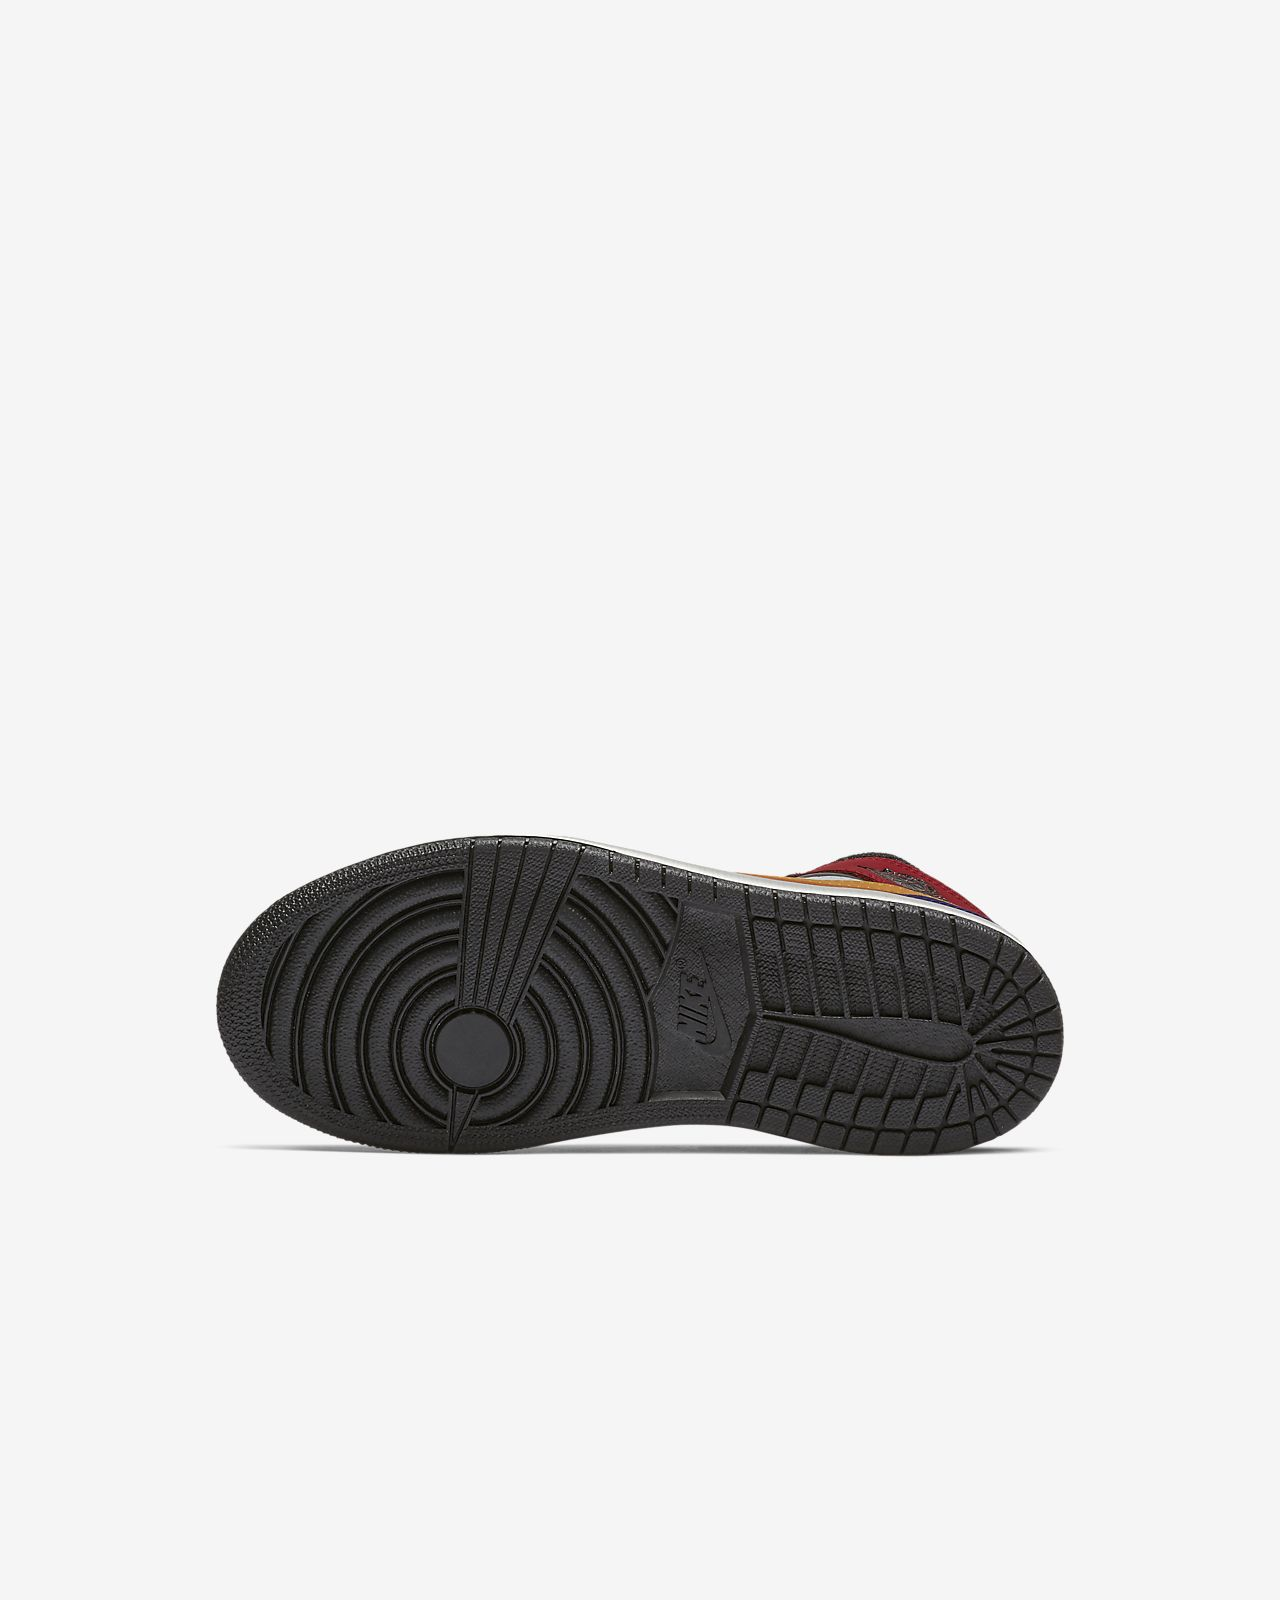 aa0d39398159 Air Jordan 1 Mid Little Kids  Shoe. Nike.com